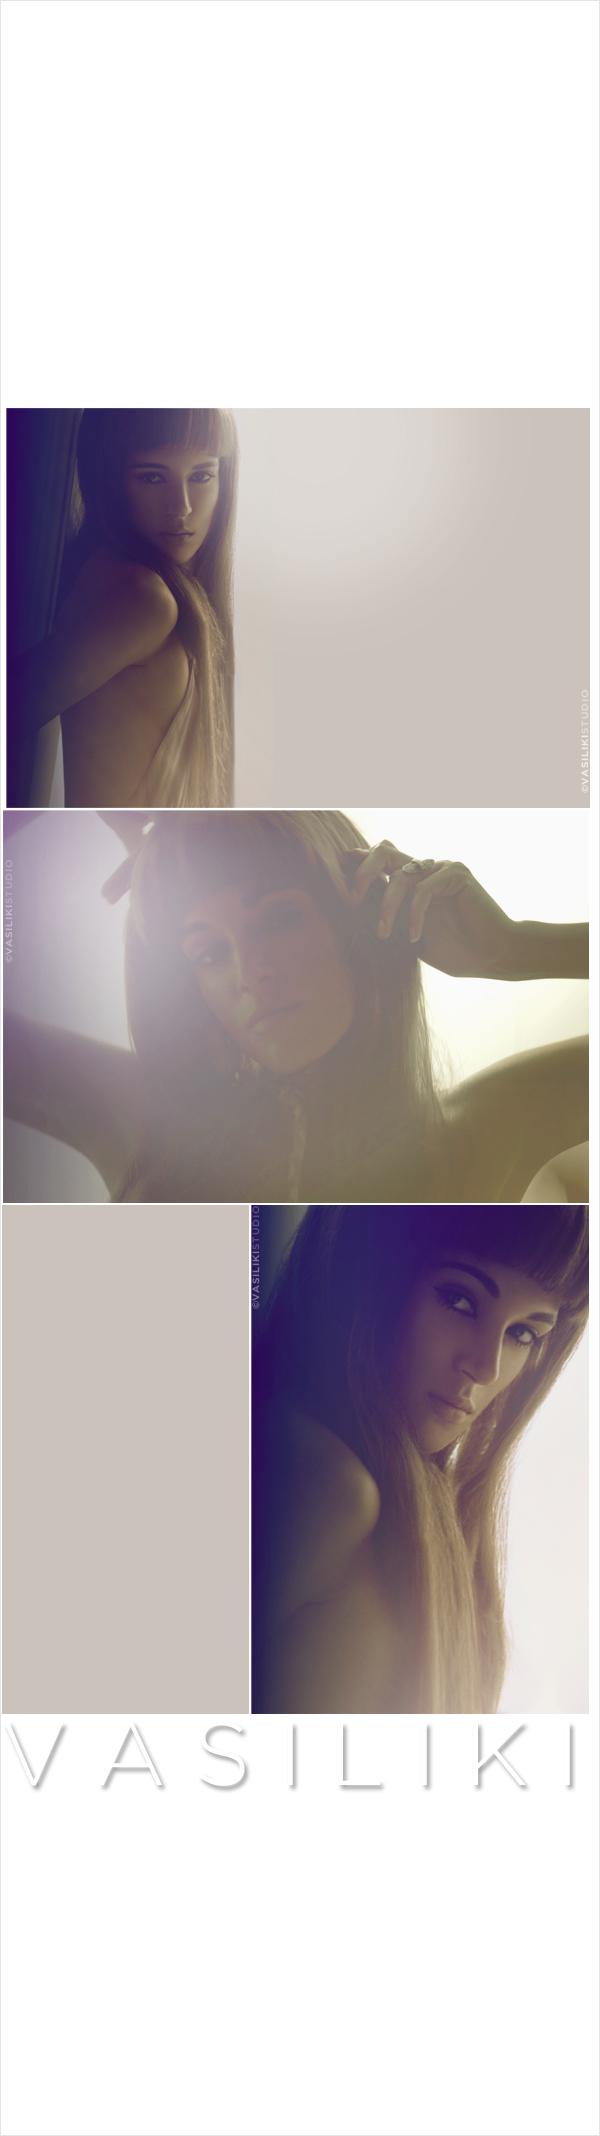 California Apr 01, 2010 VasilikiStudio@2009-2010 Beauty   Model: Justine